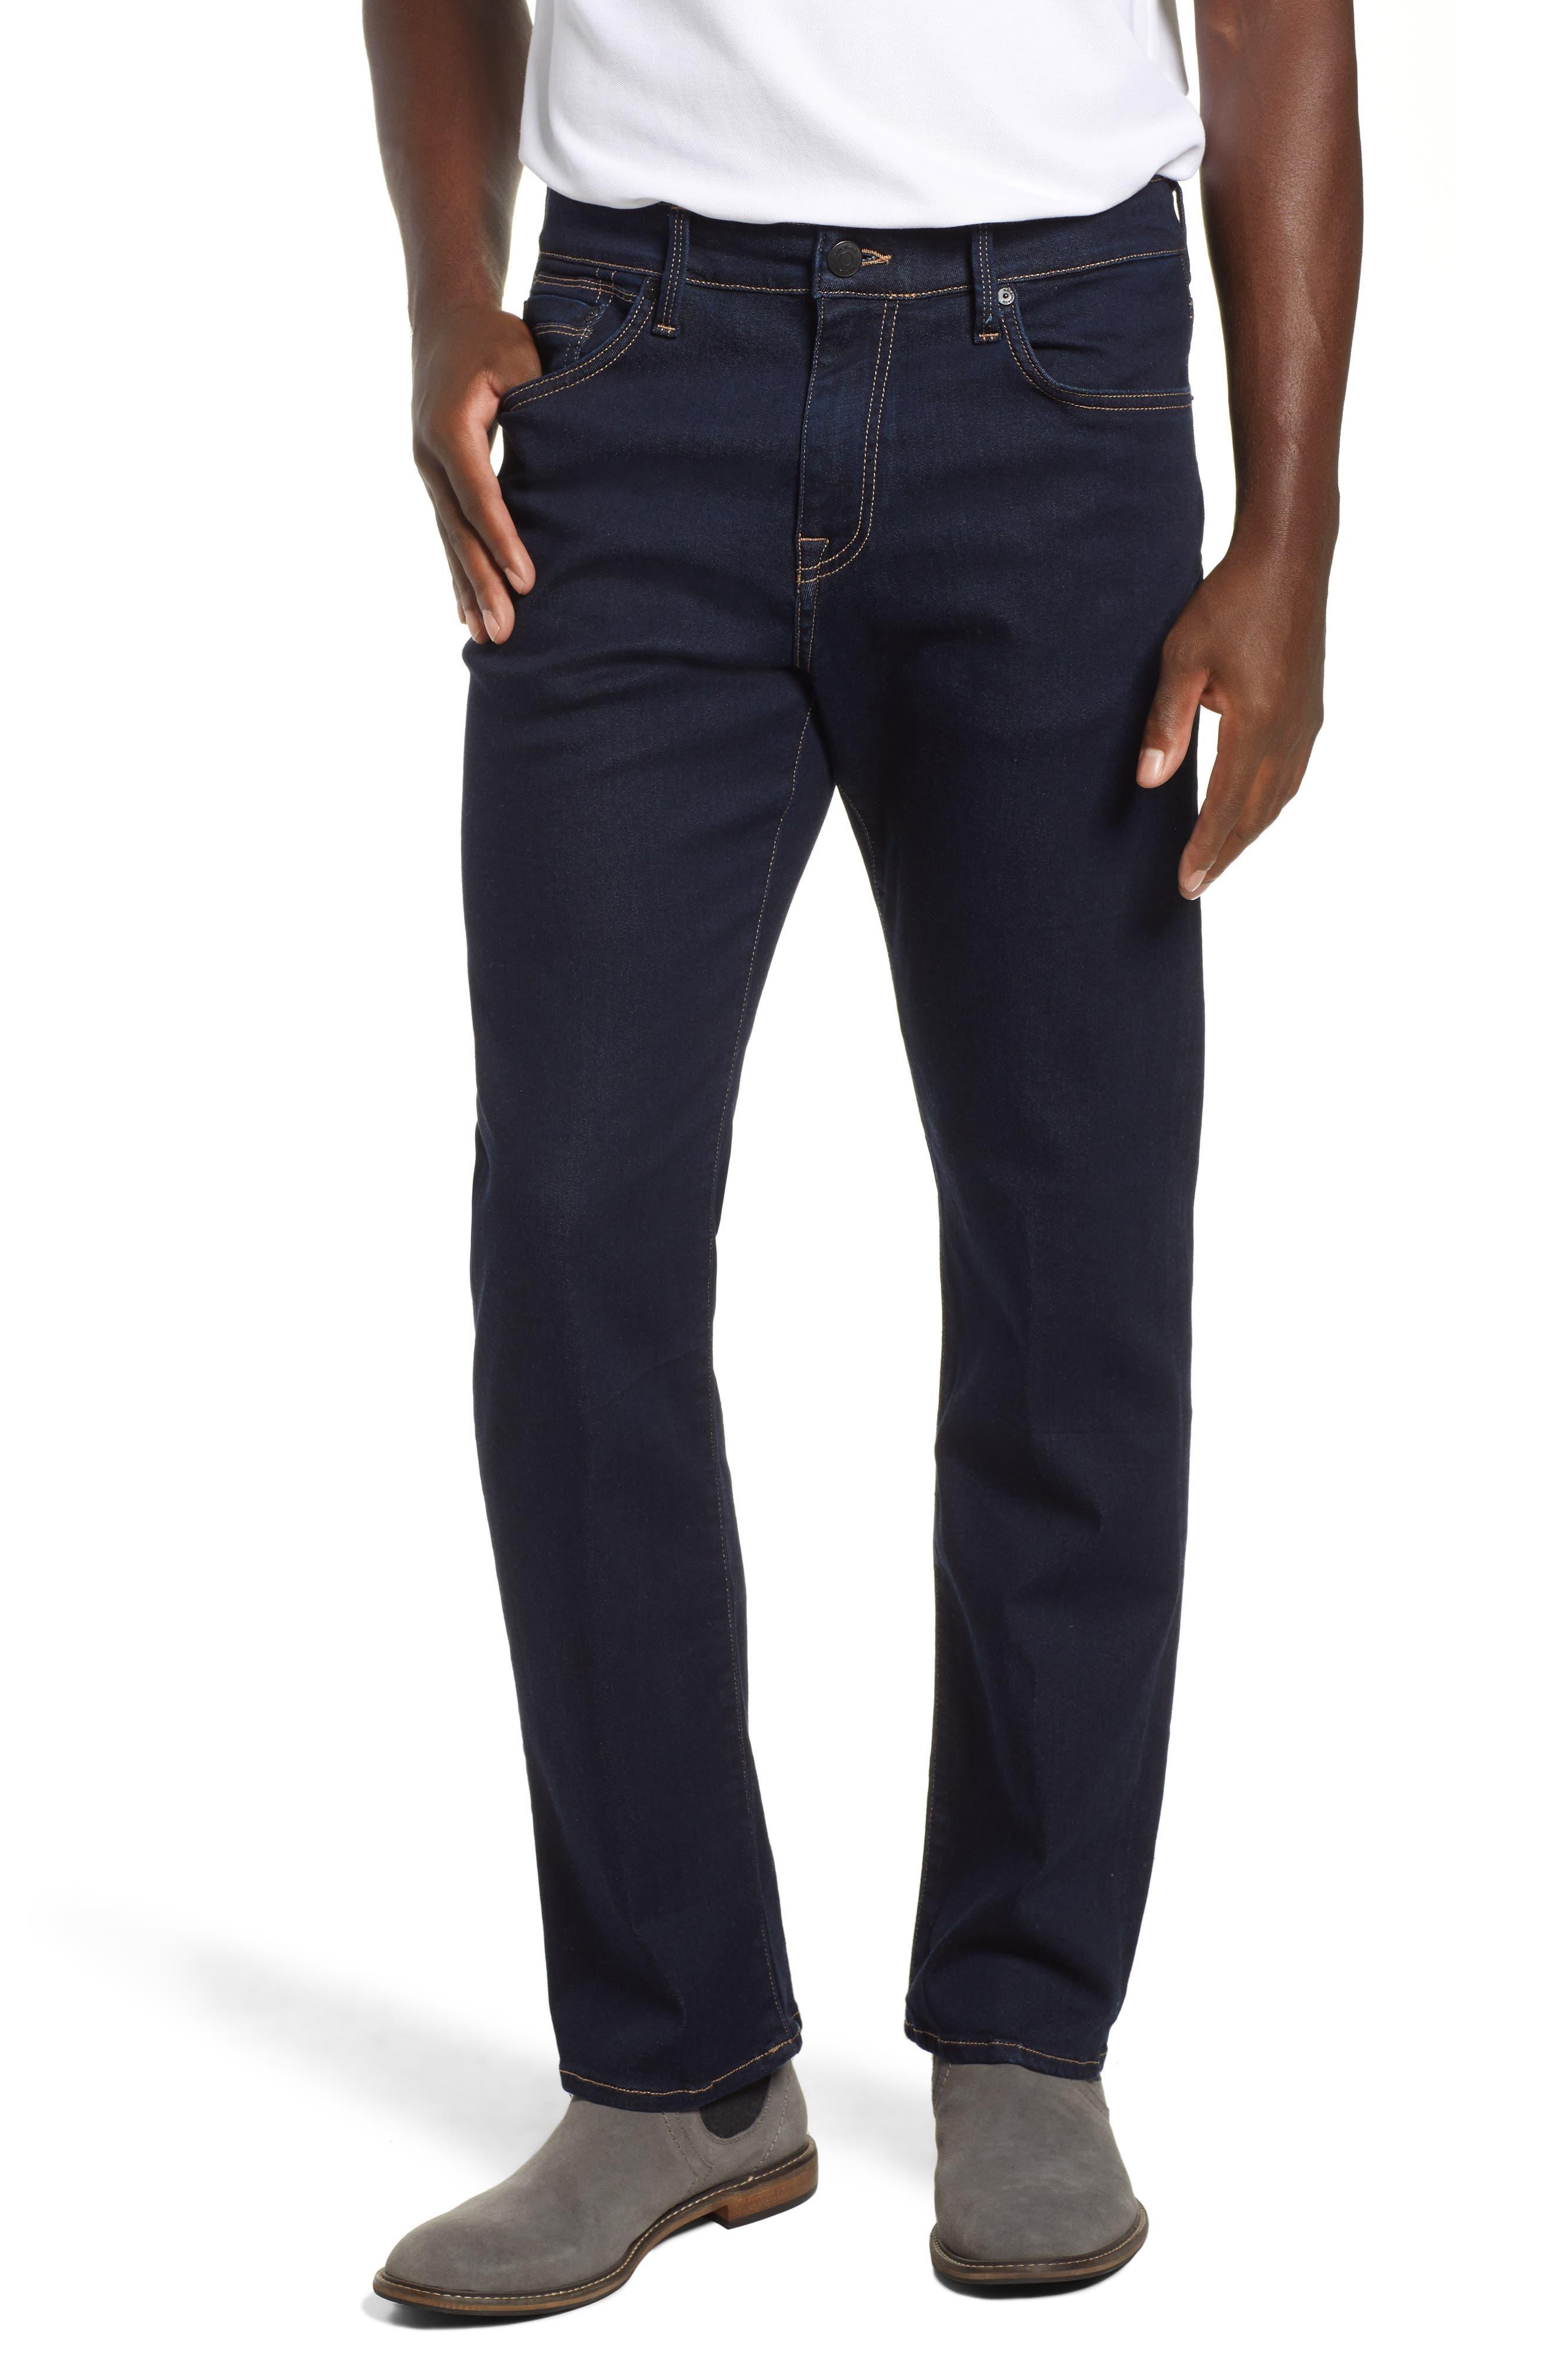 Matt Relaxed Fit Straight Leg Jeans,                             Main thumbnail 1, color,                             DEEP RINSE SOFT MOVE